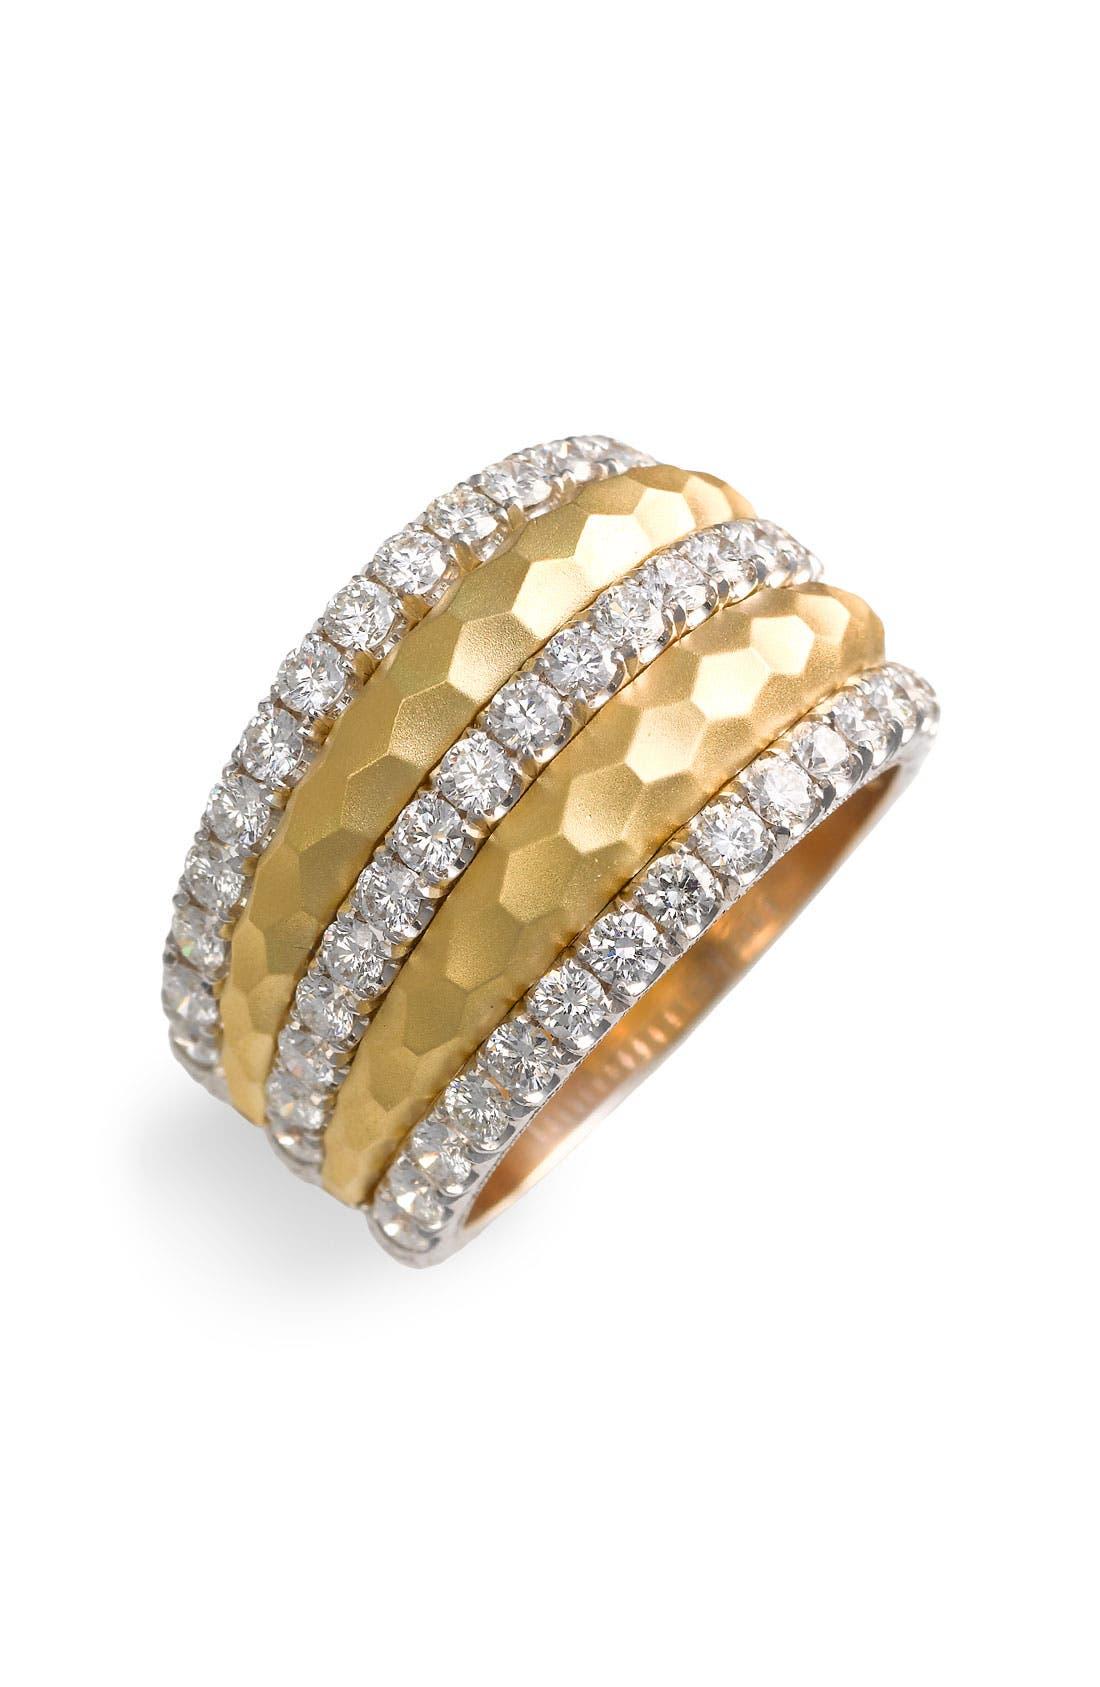 Alternate Image 1 Selected - Jack Kelége 'Byzantine' Gold & Diamond Ring